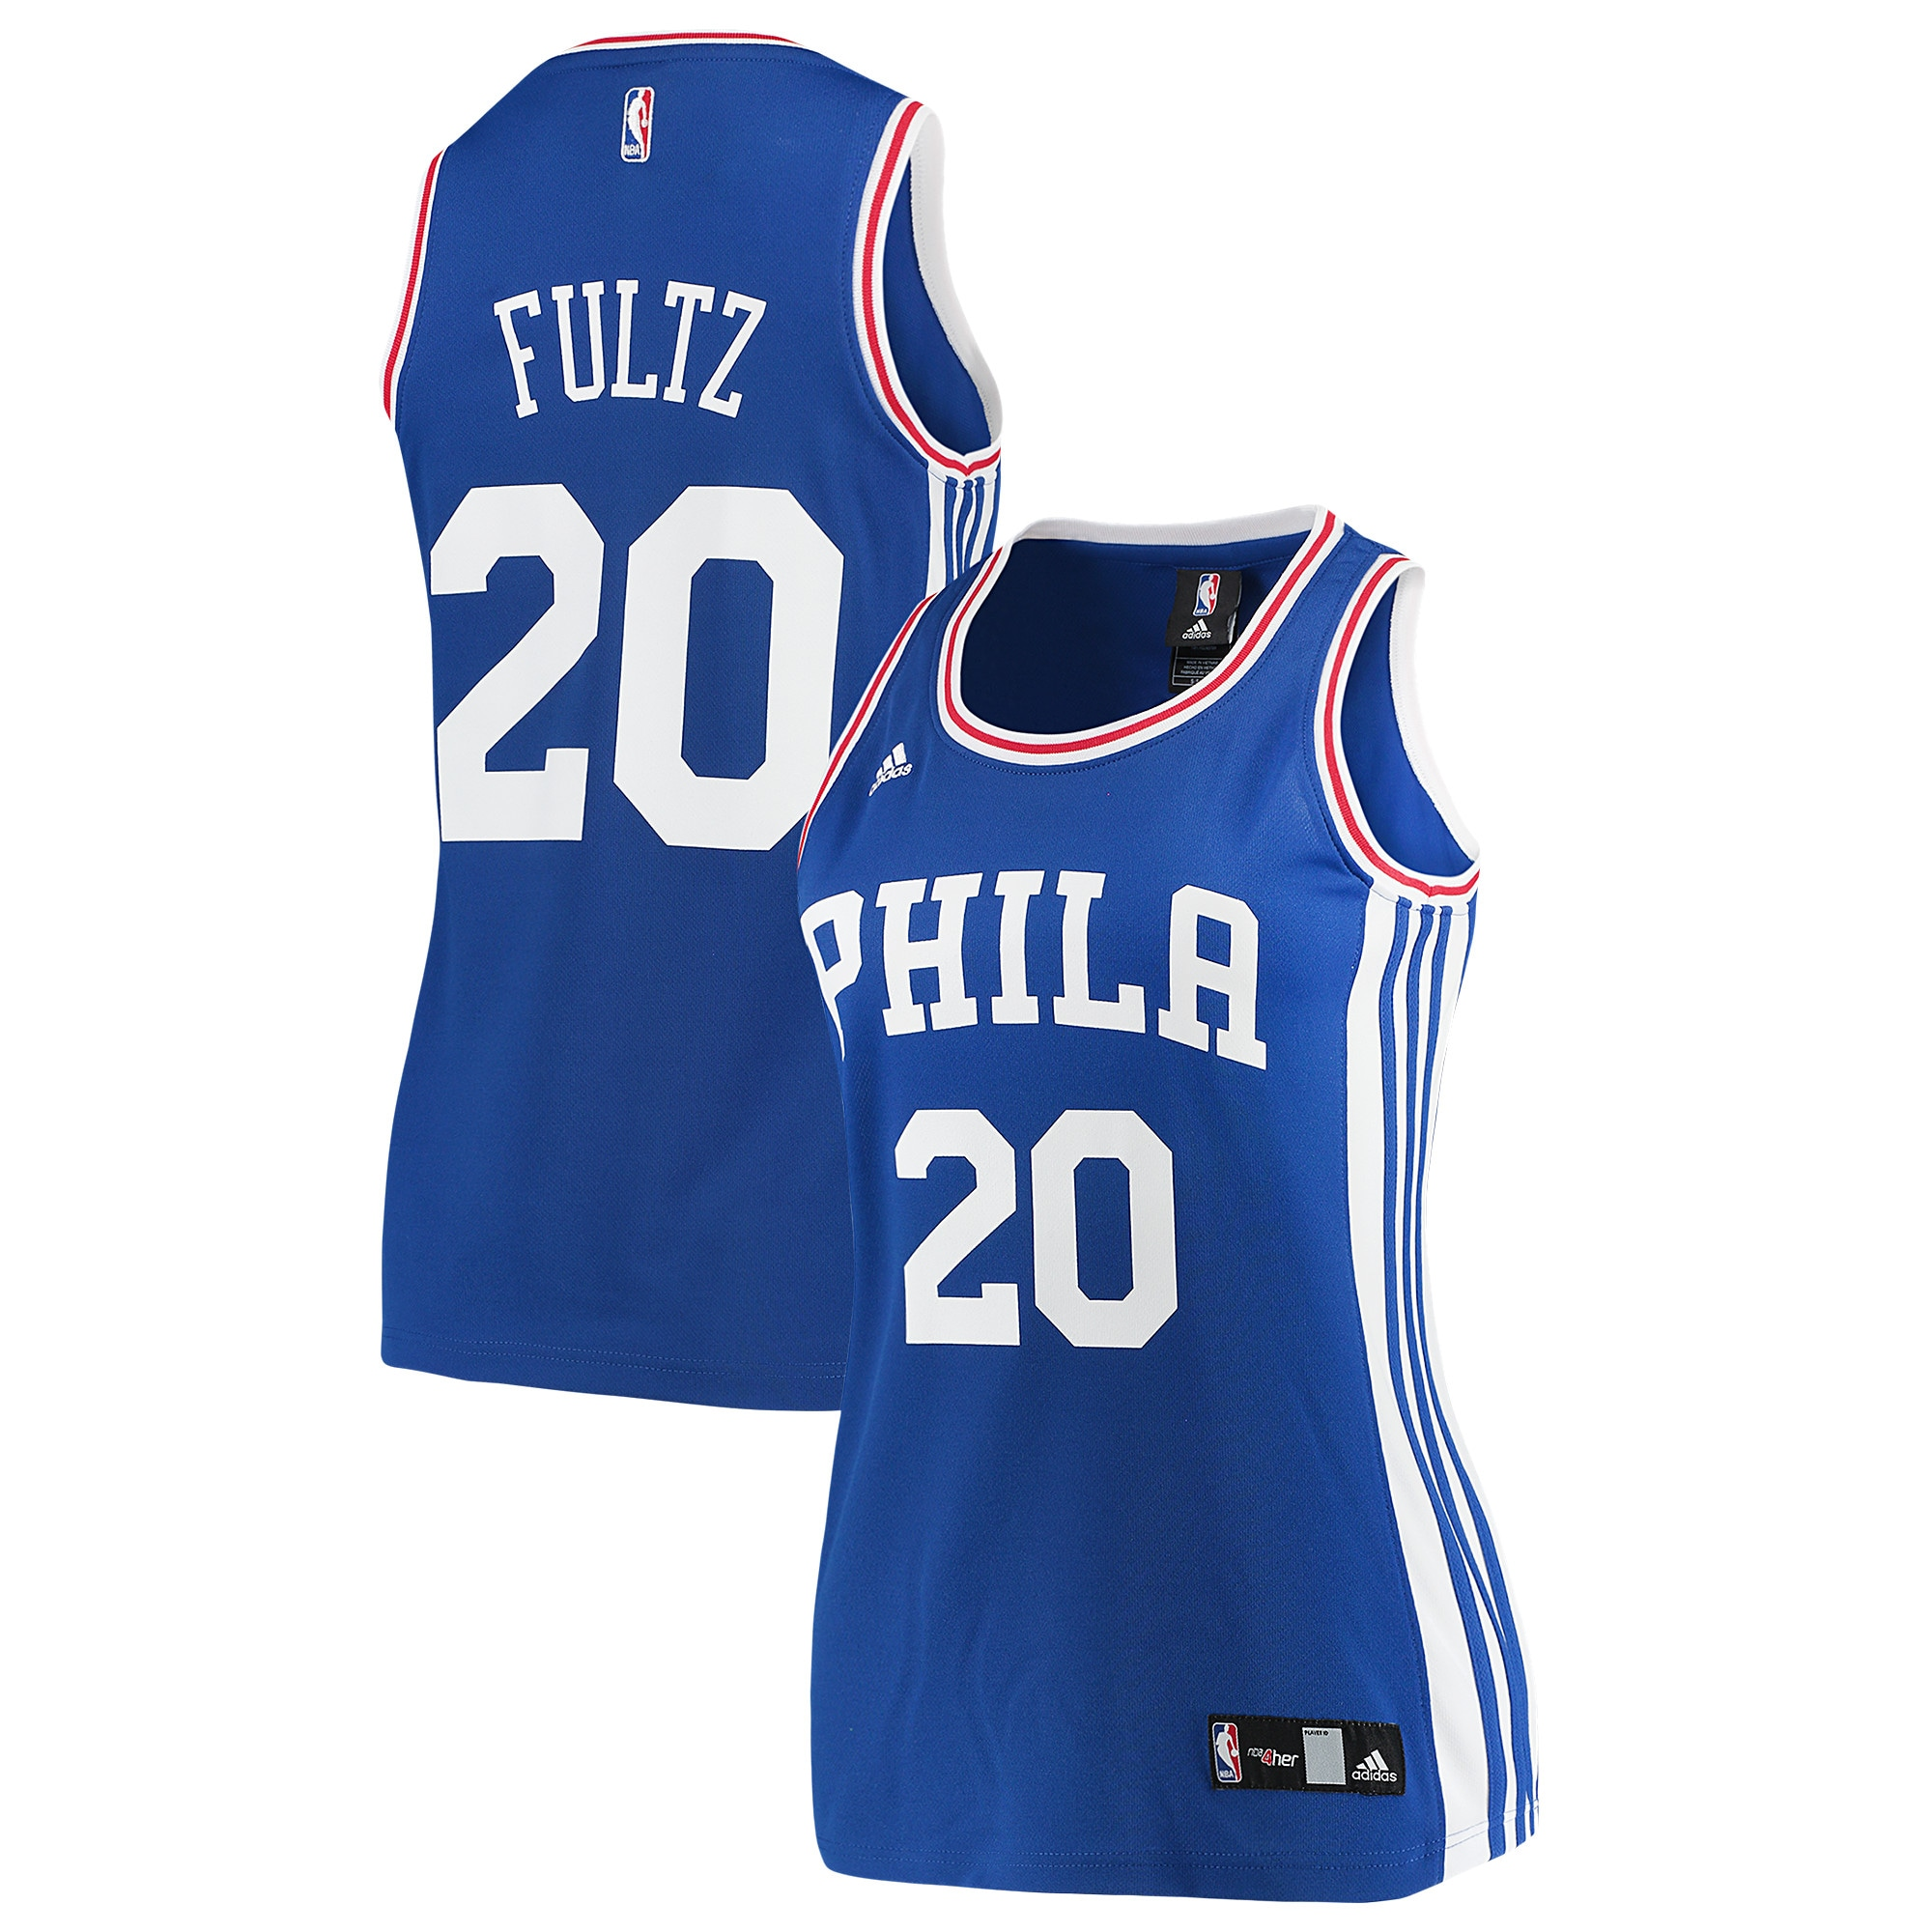 Markelle Fultz Philadelphia 76ers adidas Women's Road Replica Jersey - Royal